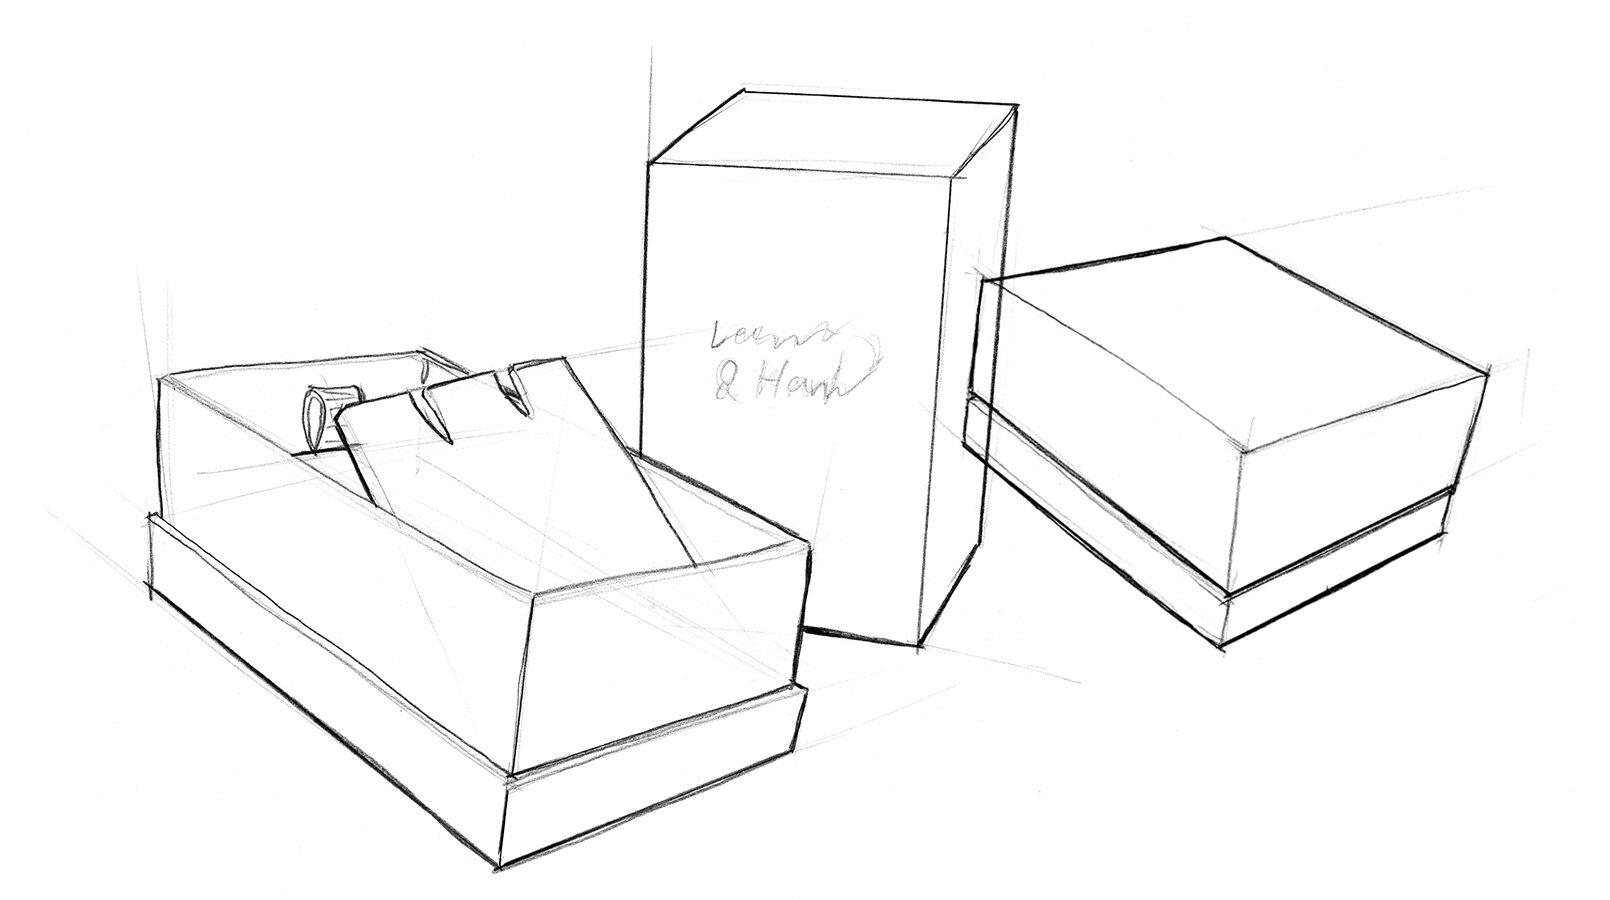 Larkspur-Hawk-Box-Jewelry-Packaging-Company-Design-1.JPG